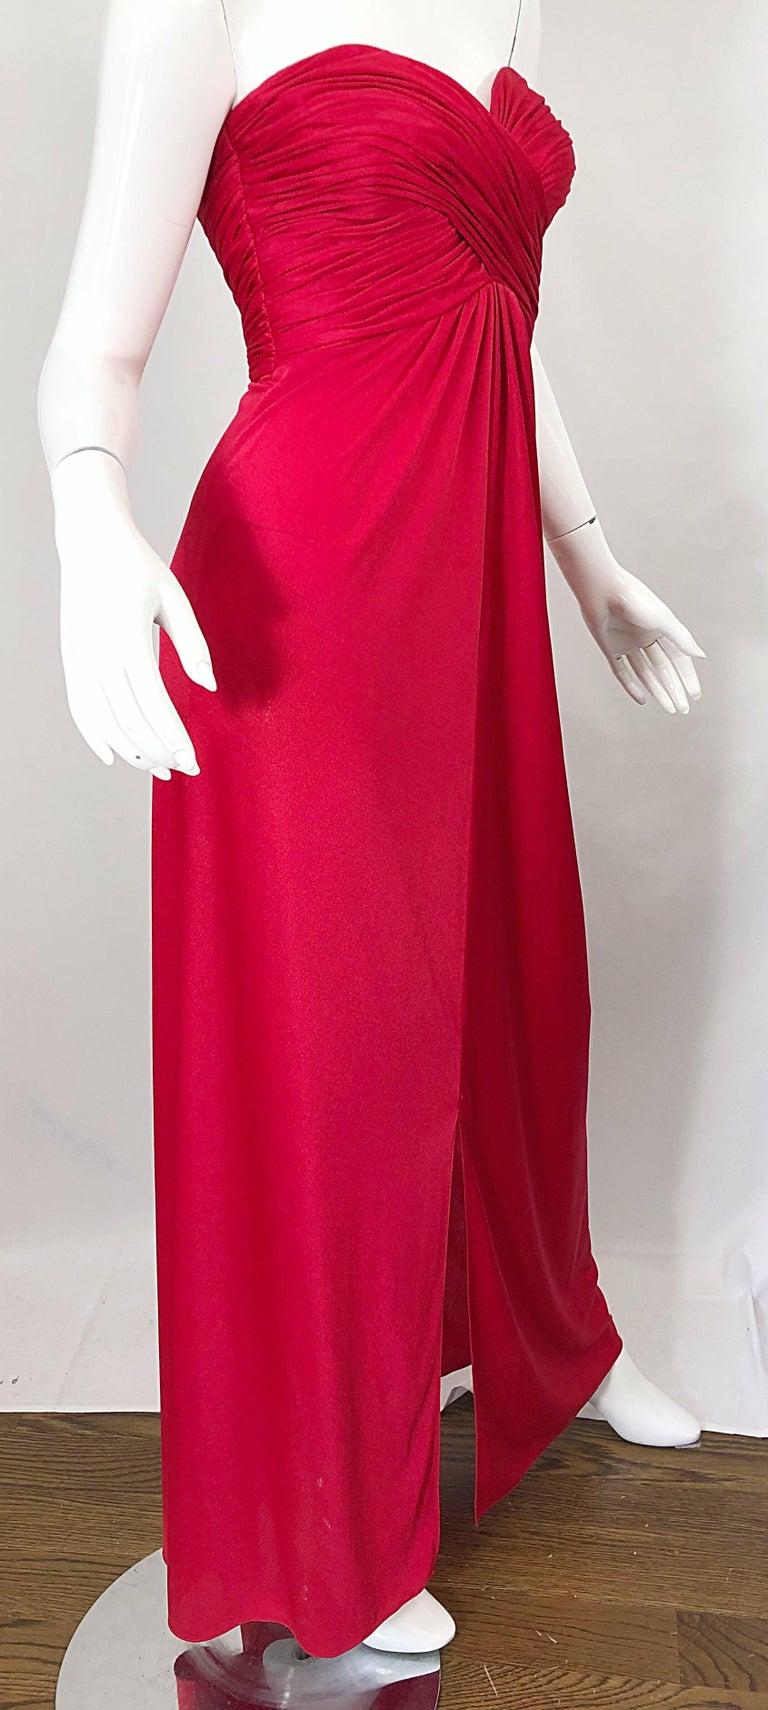 1970s Luis Estevez Silk Jersey Lipstick Red Strapless Vintage 70s Grecian Gown For Sale 3